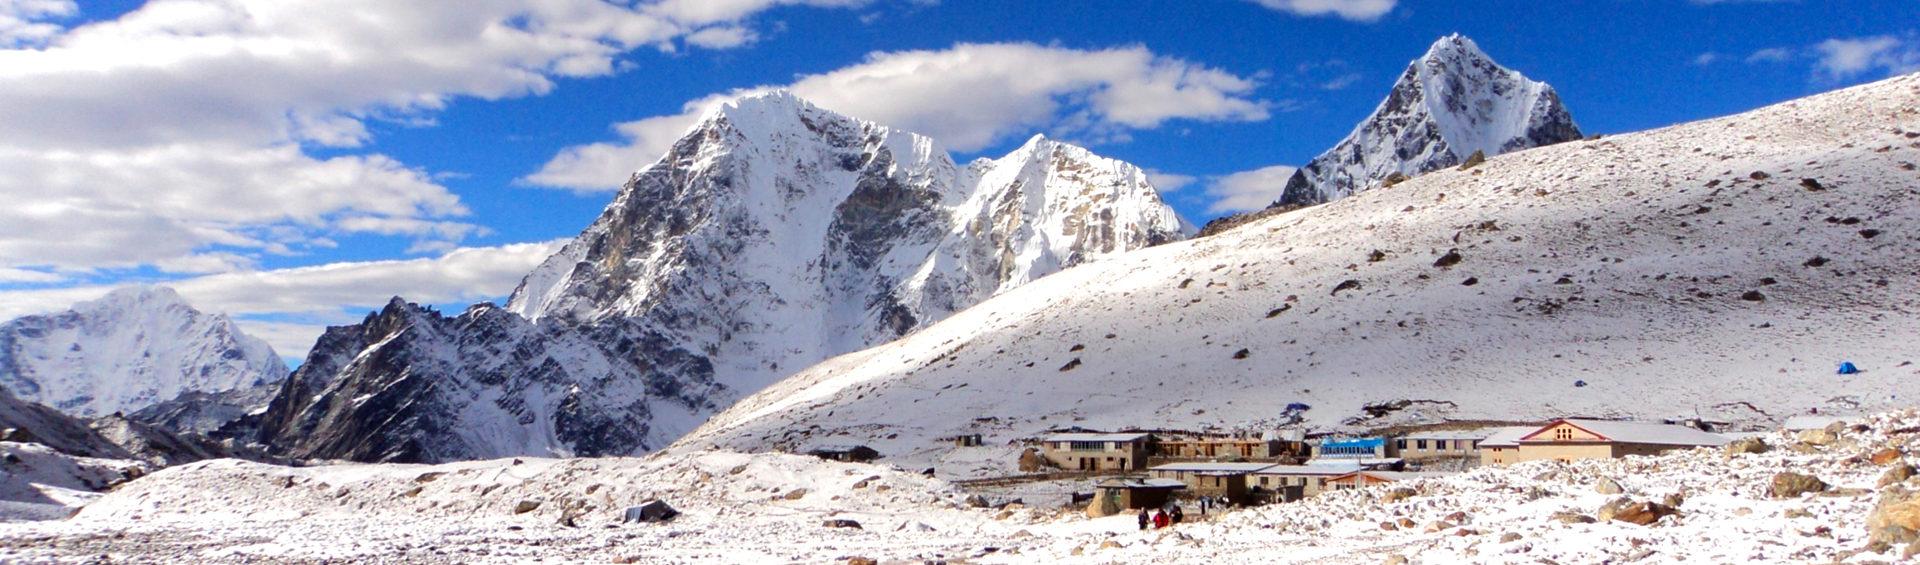 valle-khumbu-tres-valles